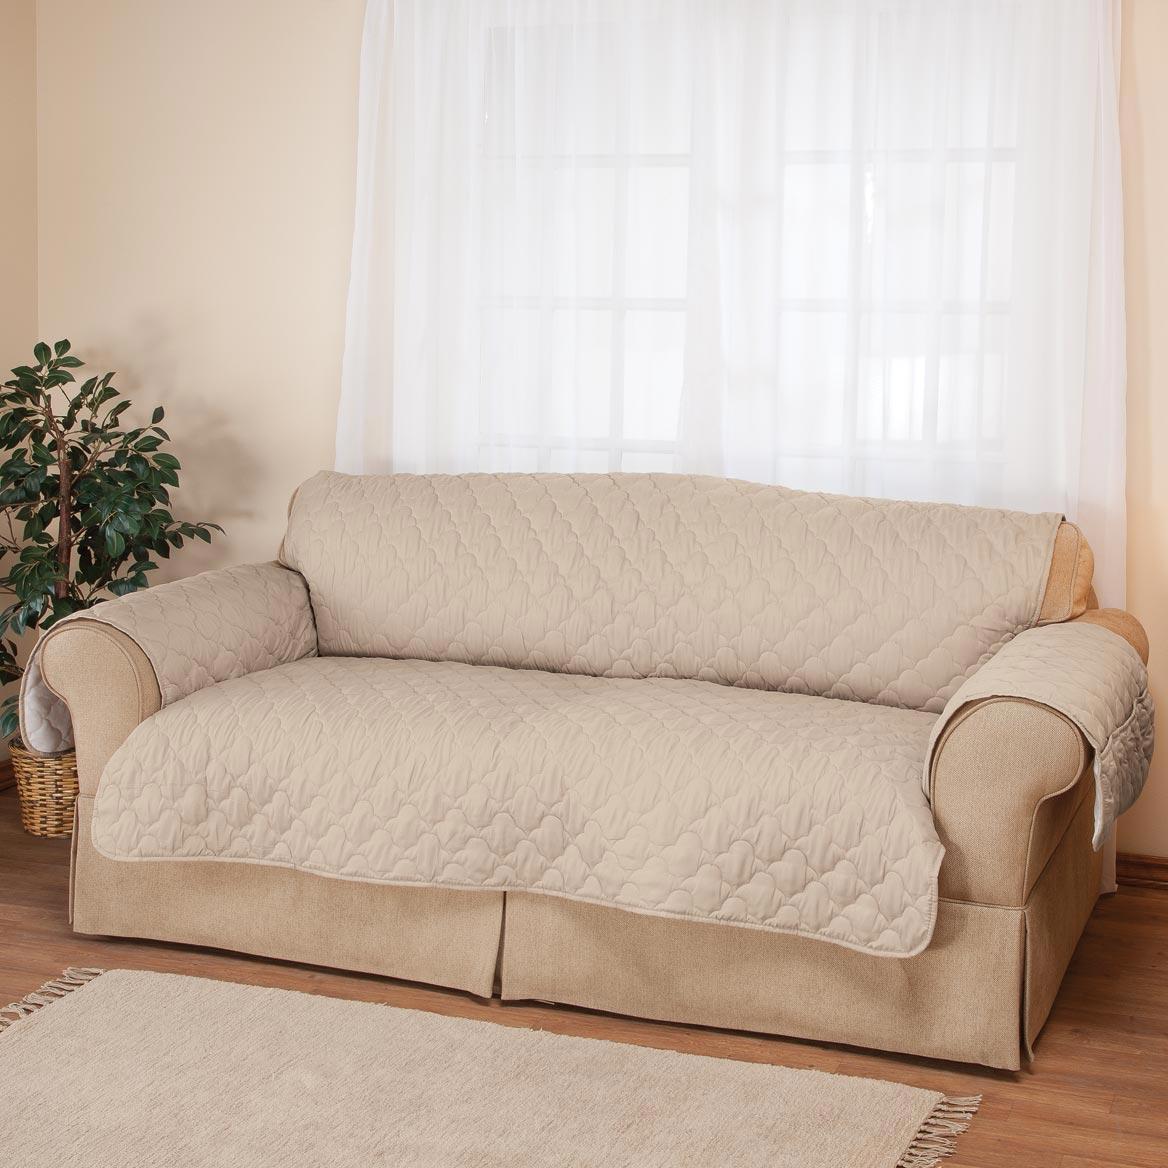 Deluxe Microfiber Sofa Cover by OakRidgeTM